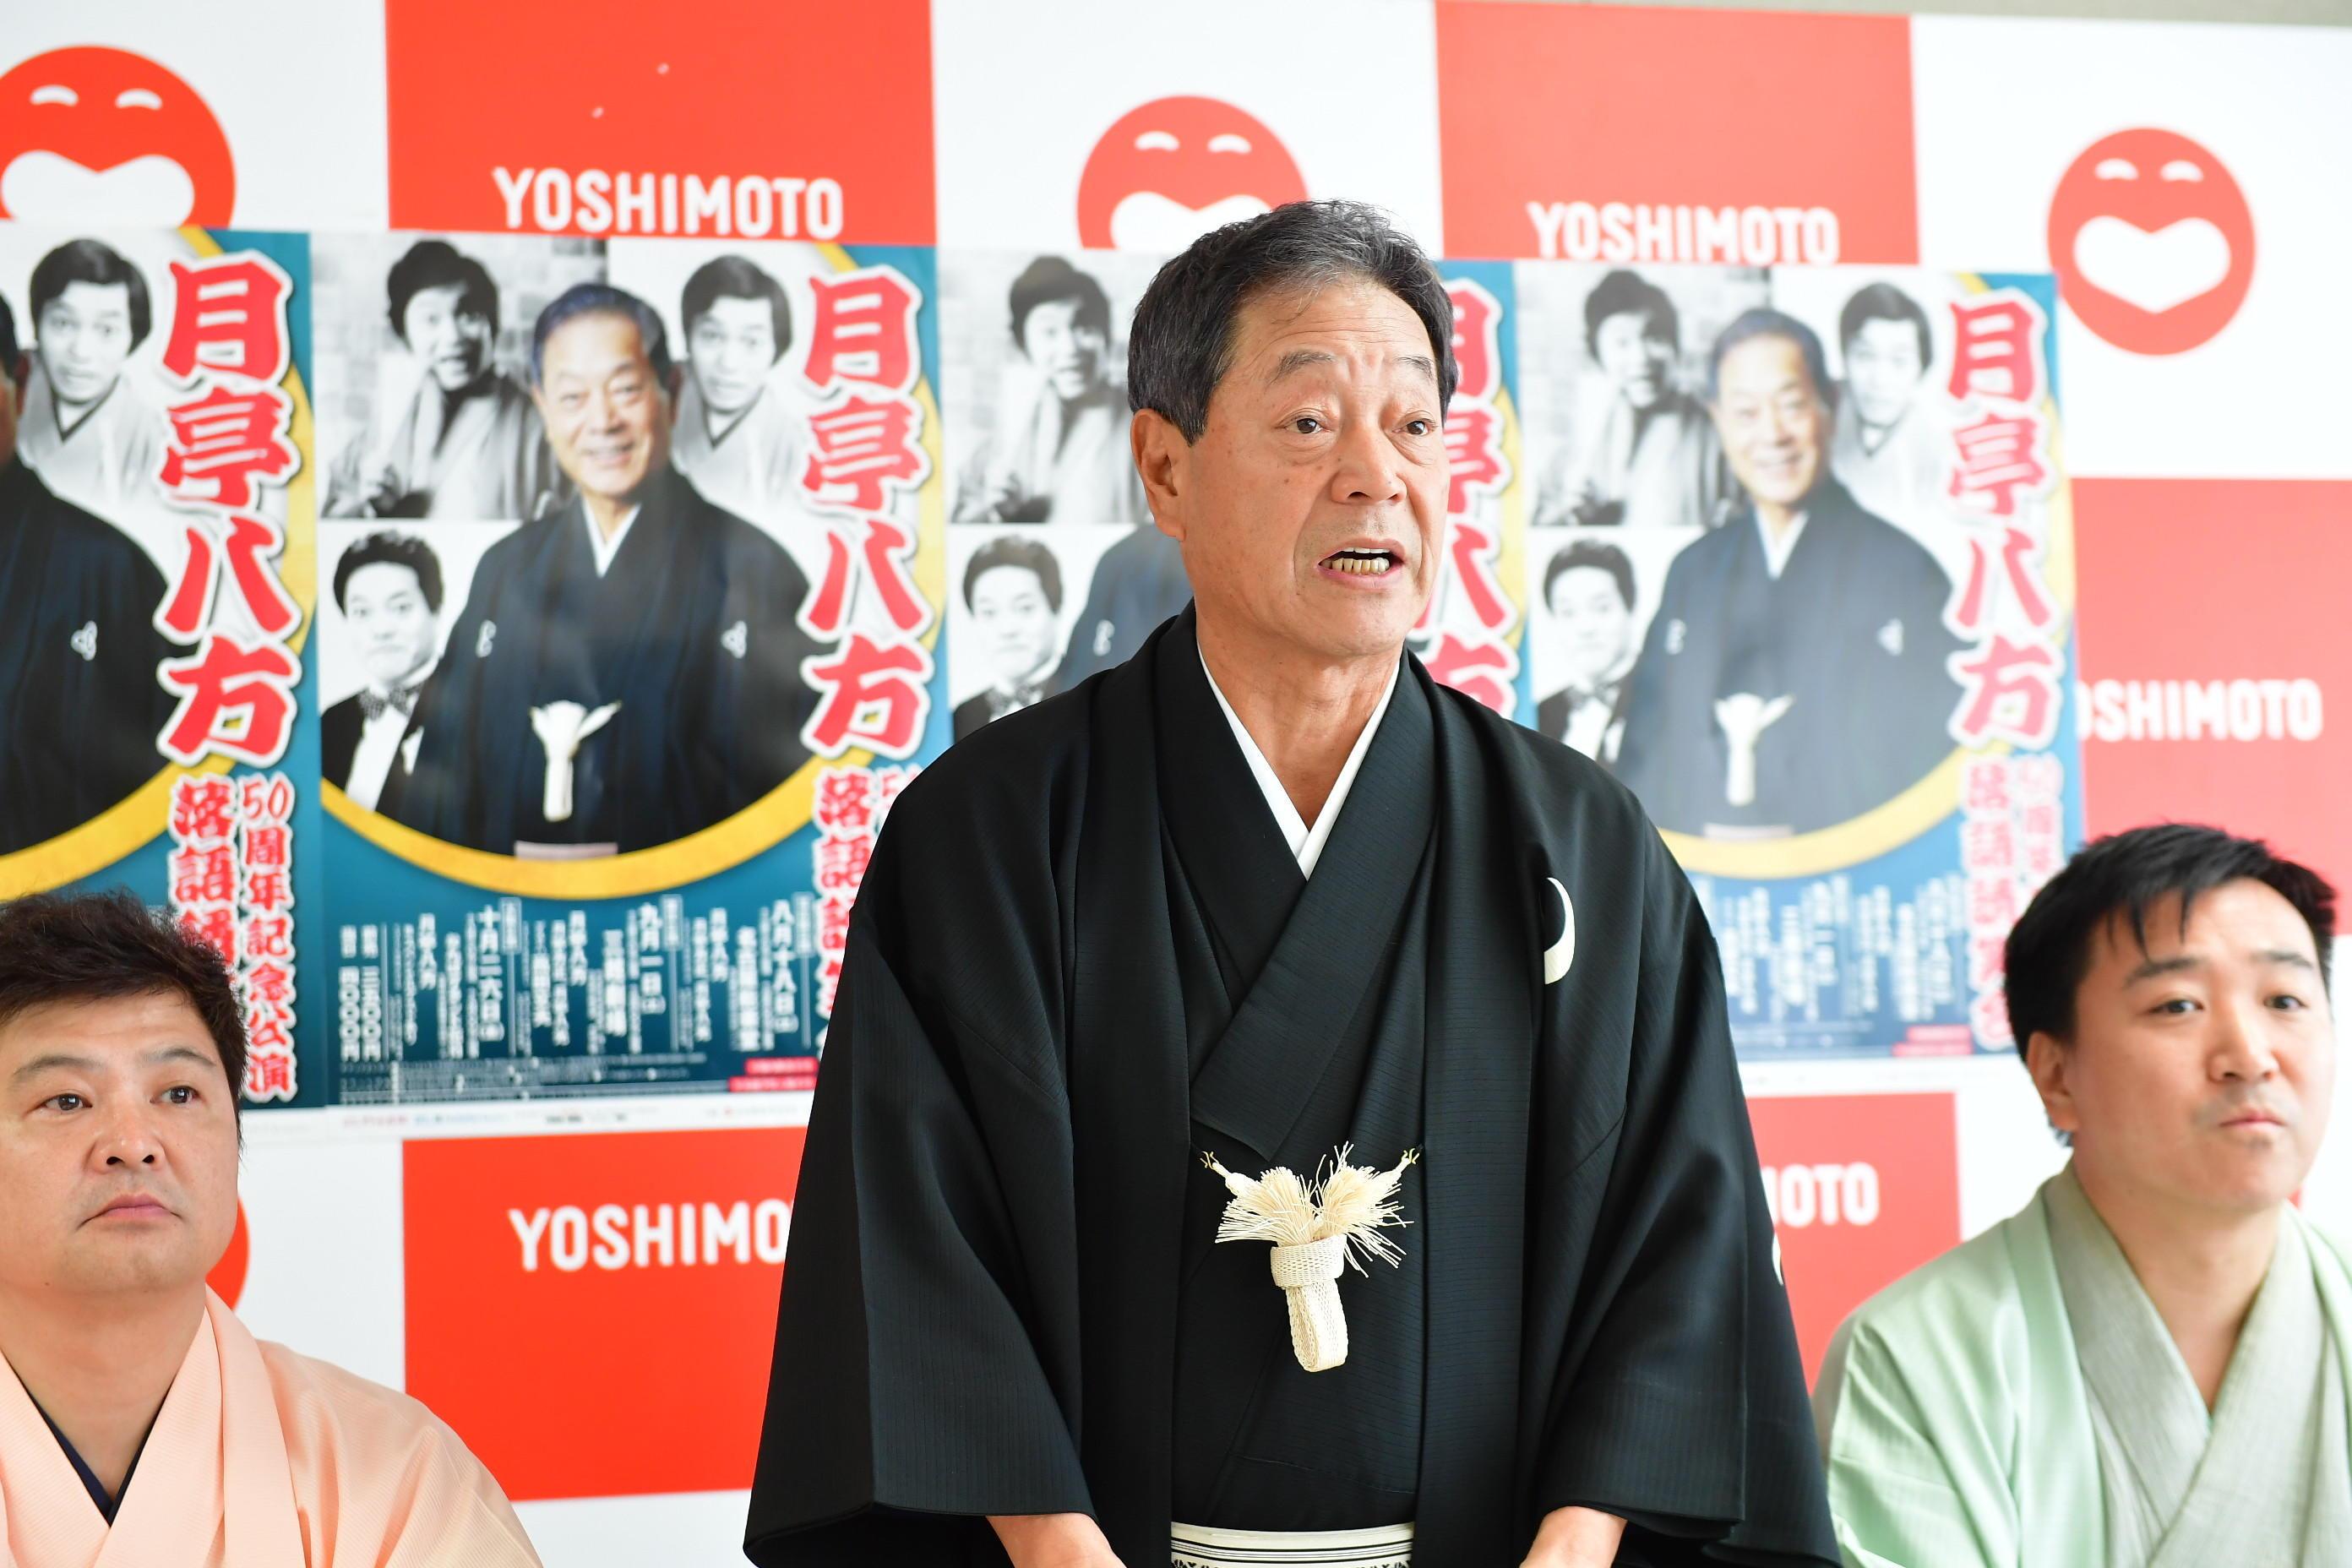 http://news.yoshimoto.co.jp/20180806204257-8714747a5ab351ad8a0c4aa40ffd9edcbf5e305a.jpg